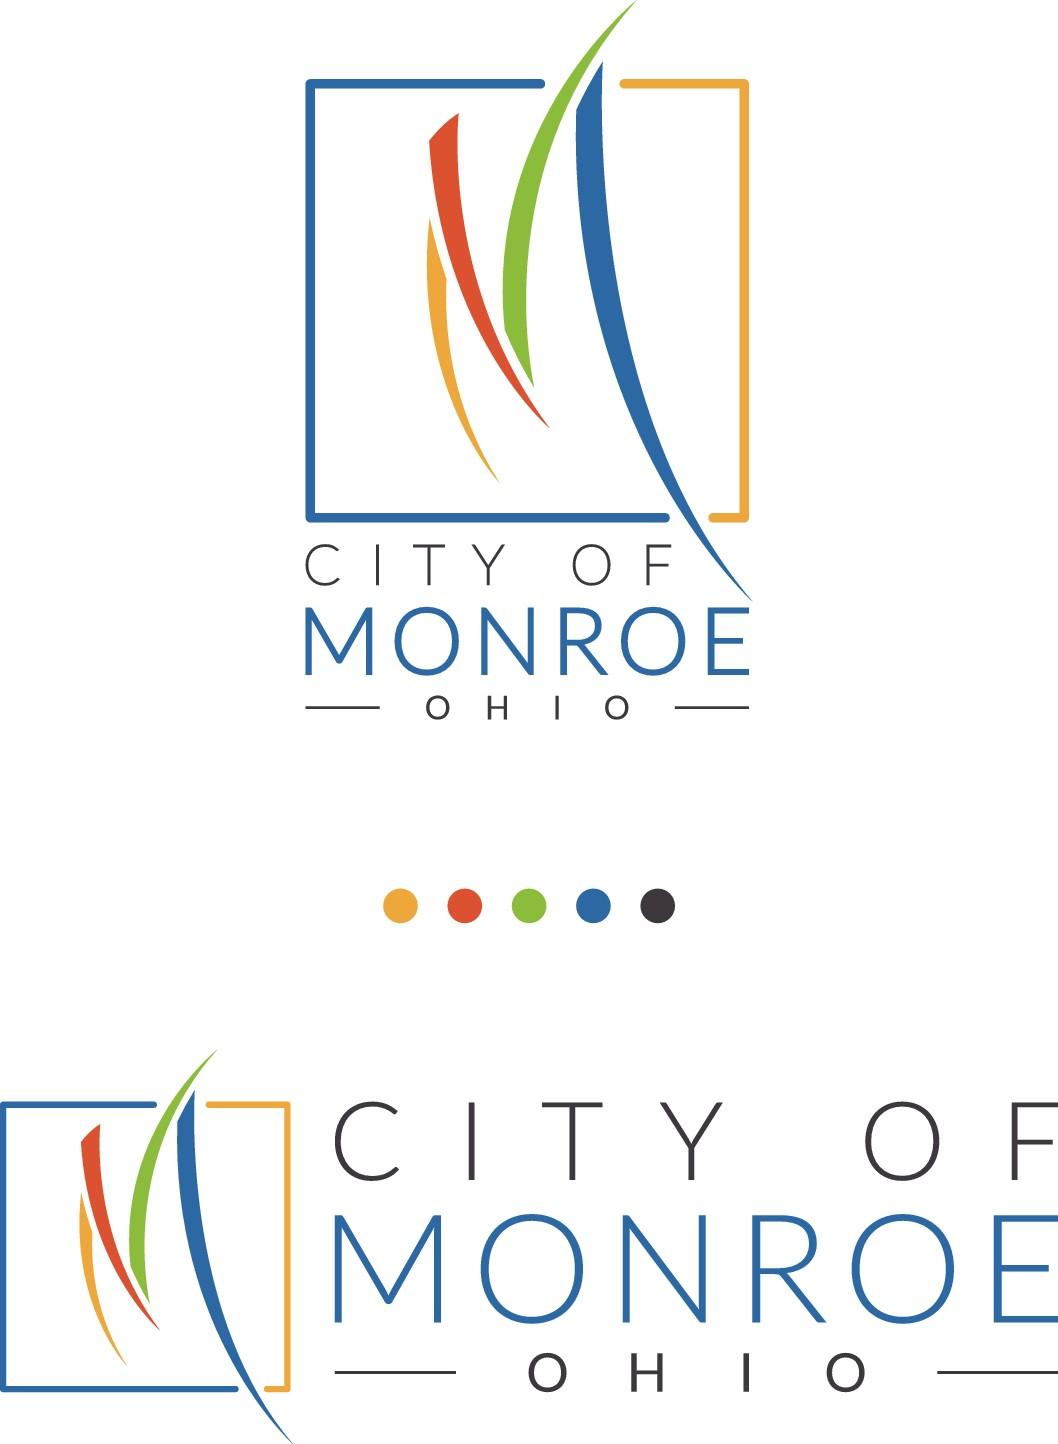 Progressive city needs a new logo!